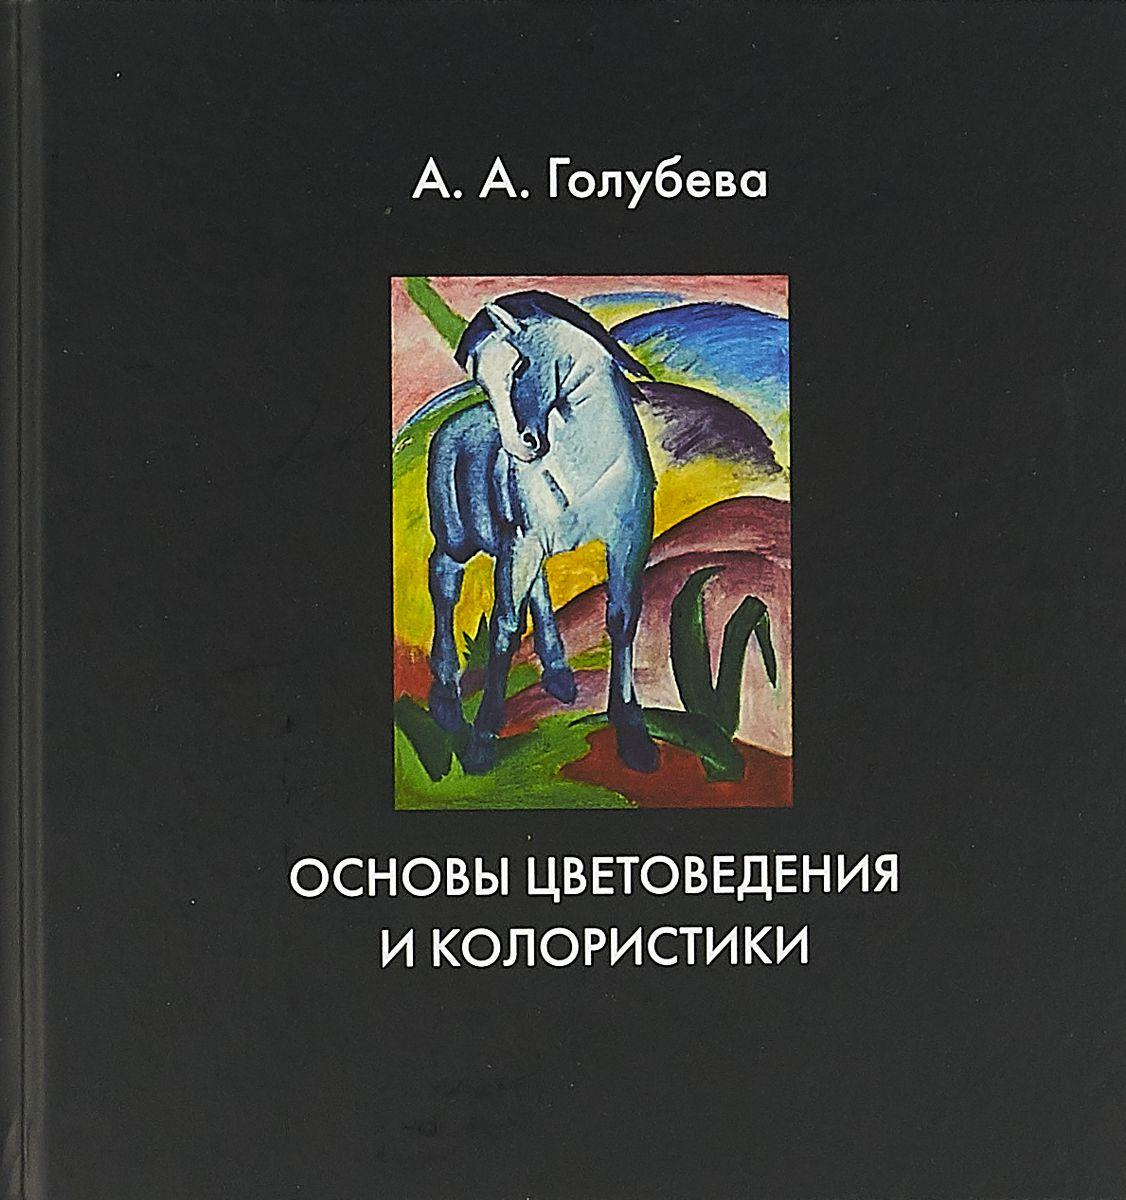 Основы цветоведения и колористики. Голубева А. А.